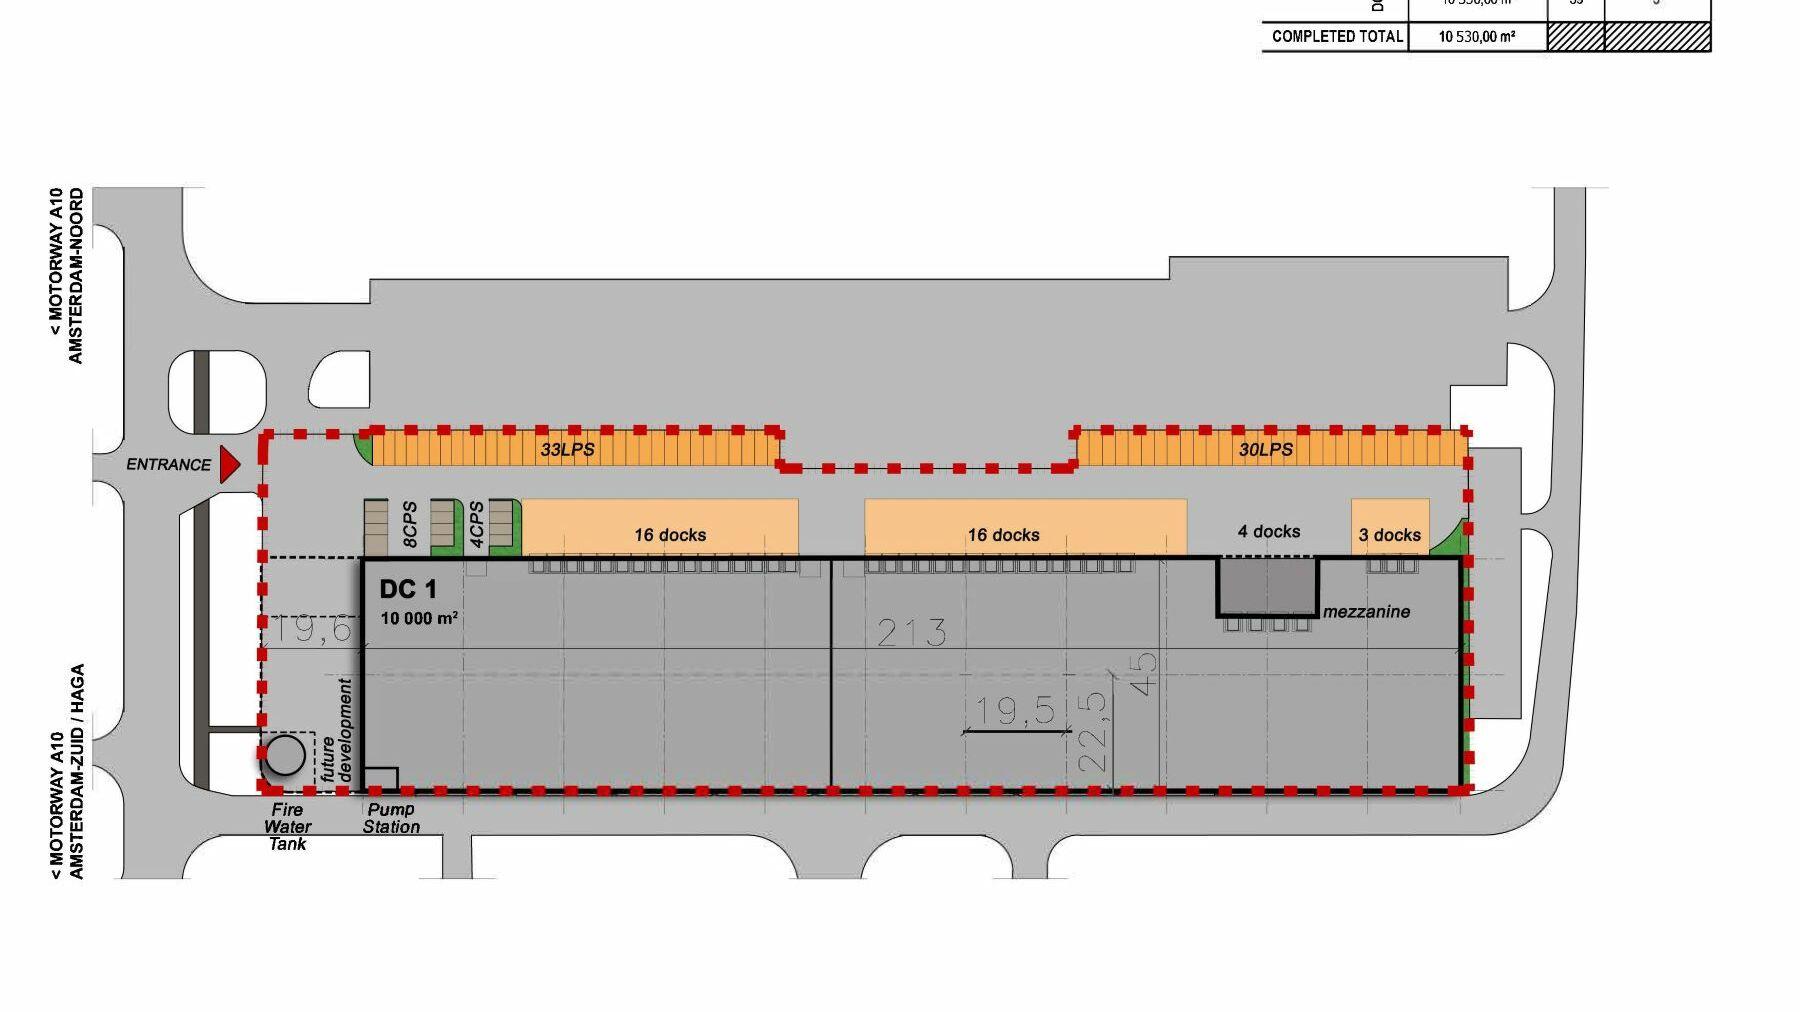 DPM-Prologis-Park-Amsterdam-City-DC1_siteplan.jpg